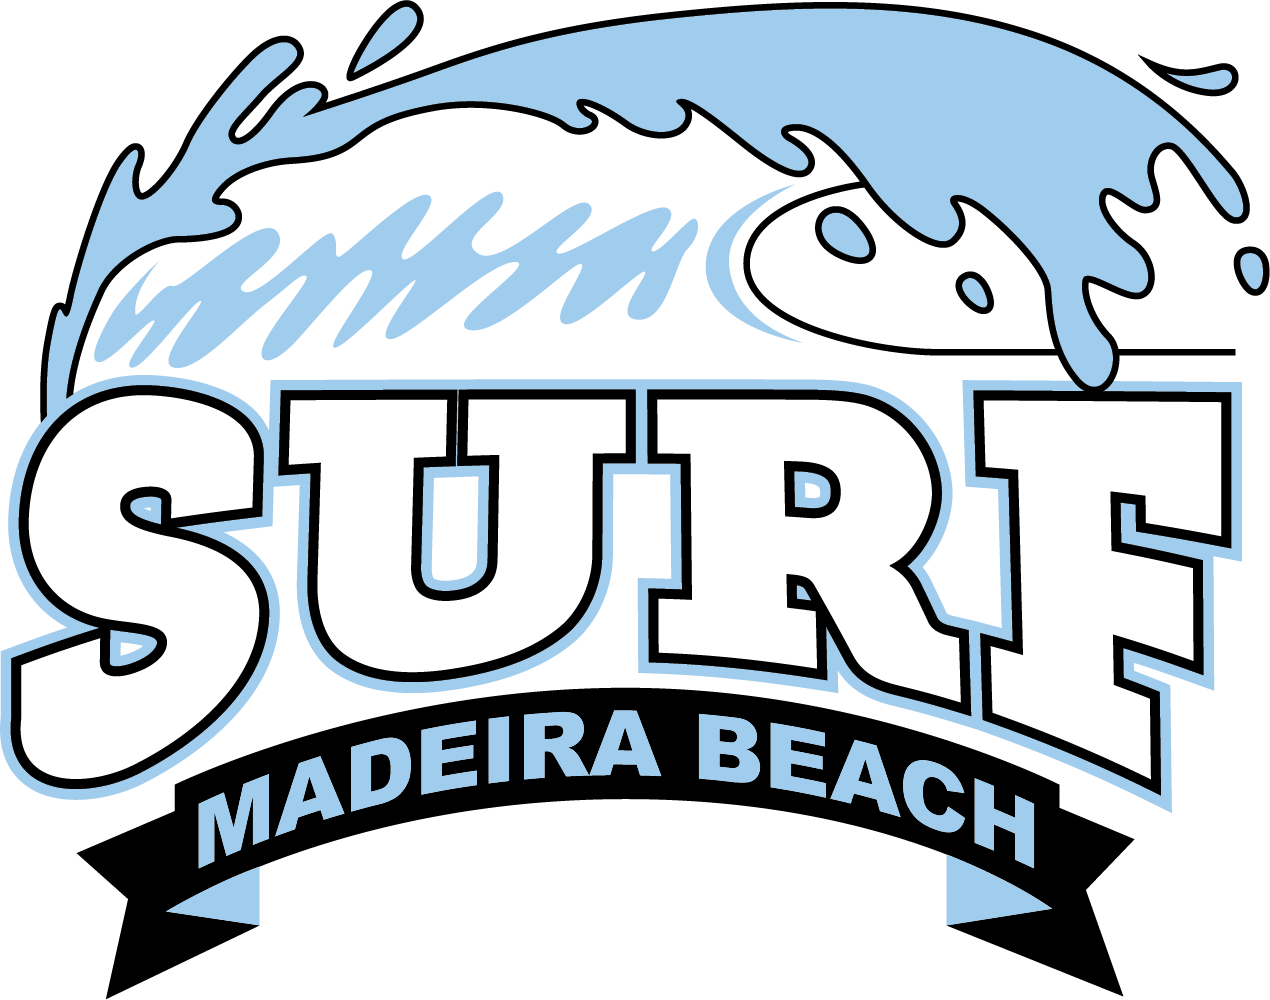 MadeiraBeachSurf